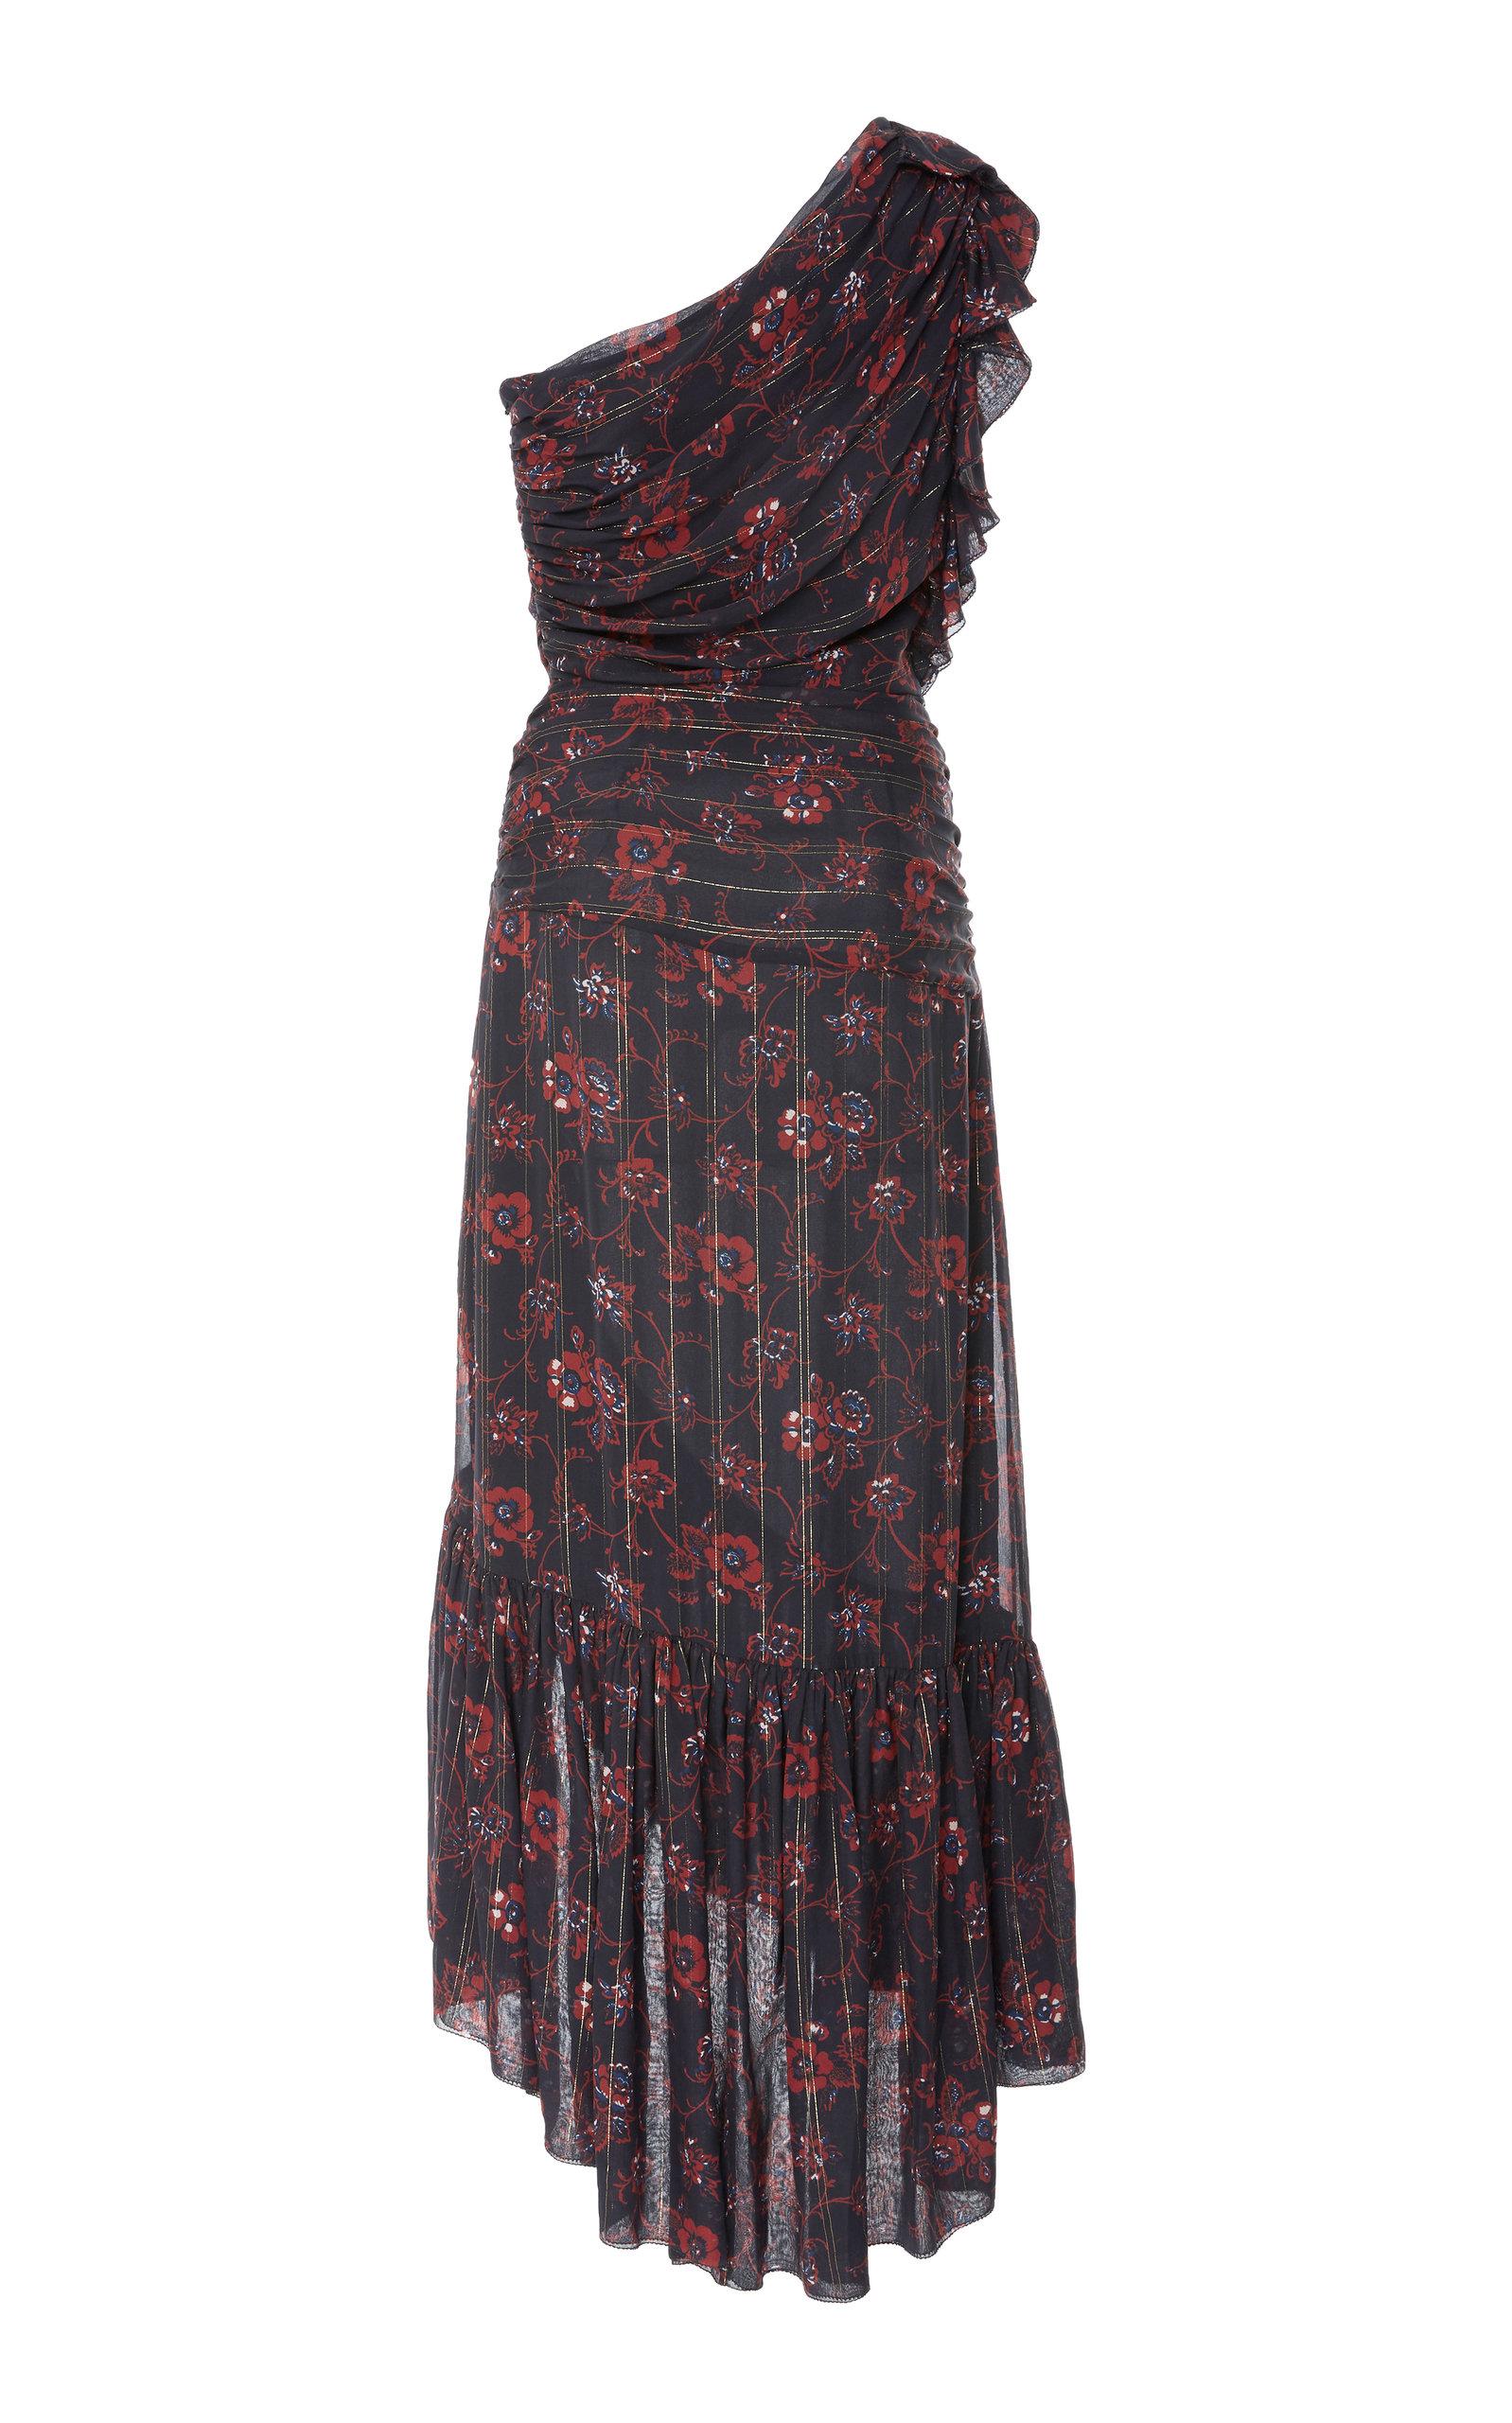 Dress Operandi JohnsonModa Belline By Ulla gyvY7mb6If